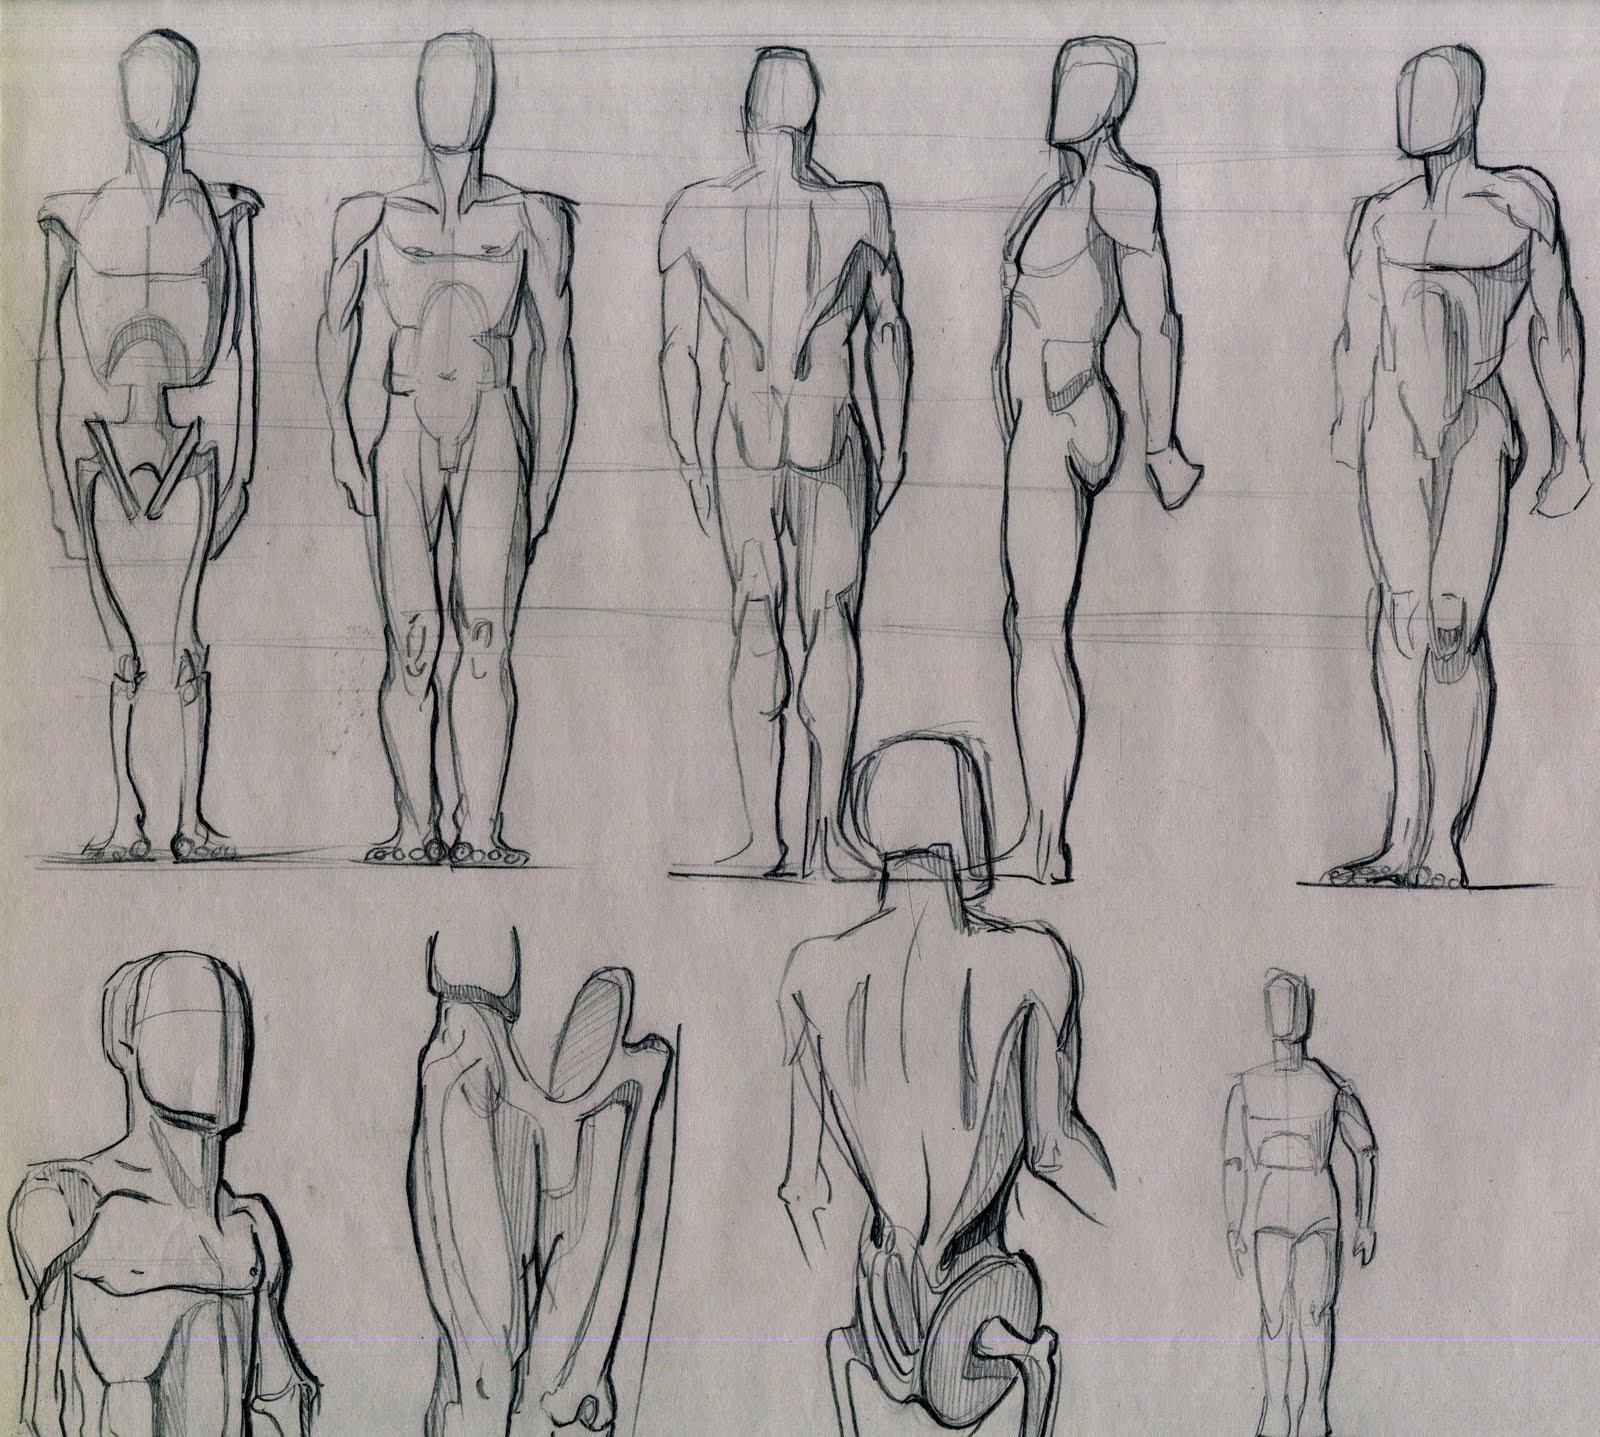 http://1.bp.blogspot.com/_aHxXOspCBzg/TGr4TPDUZwI/AAAAAAAAAQk/8WhLW01asEQ/s1600/bodies037.jpg